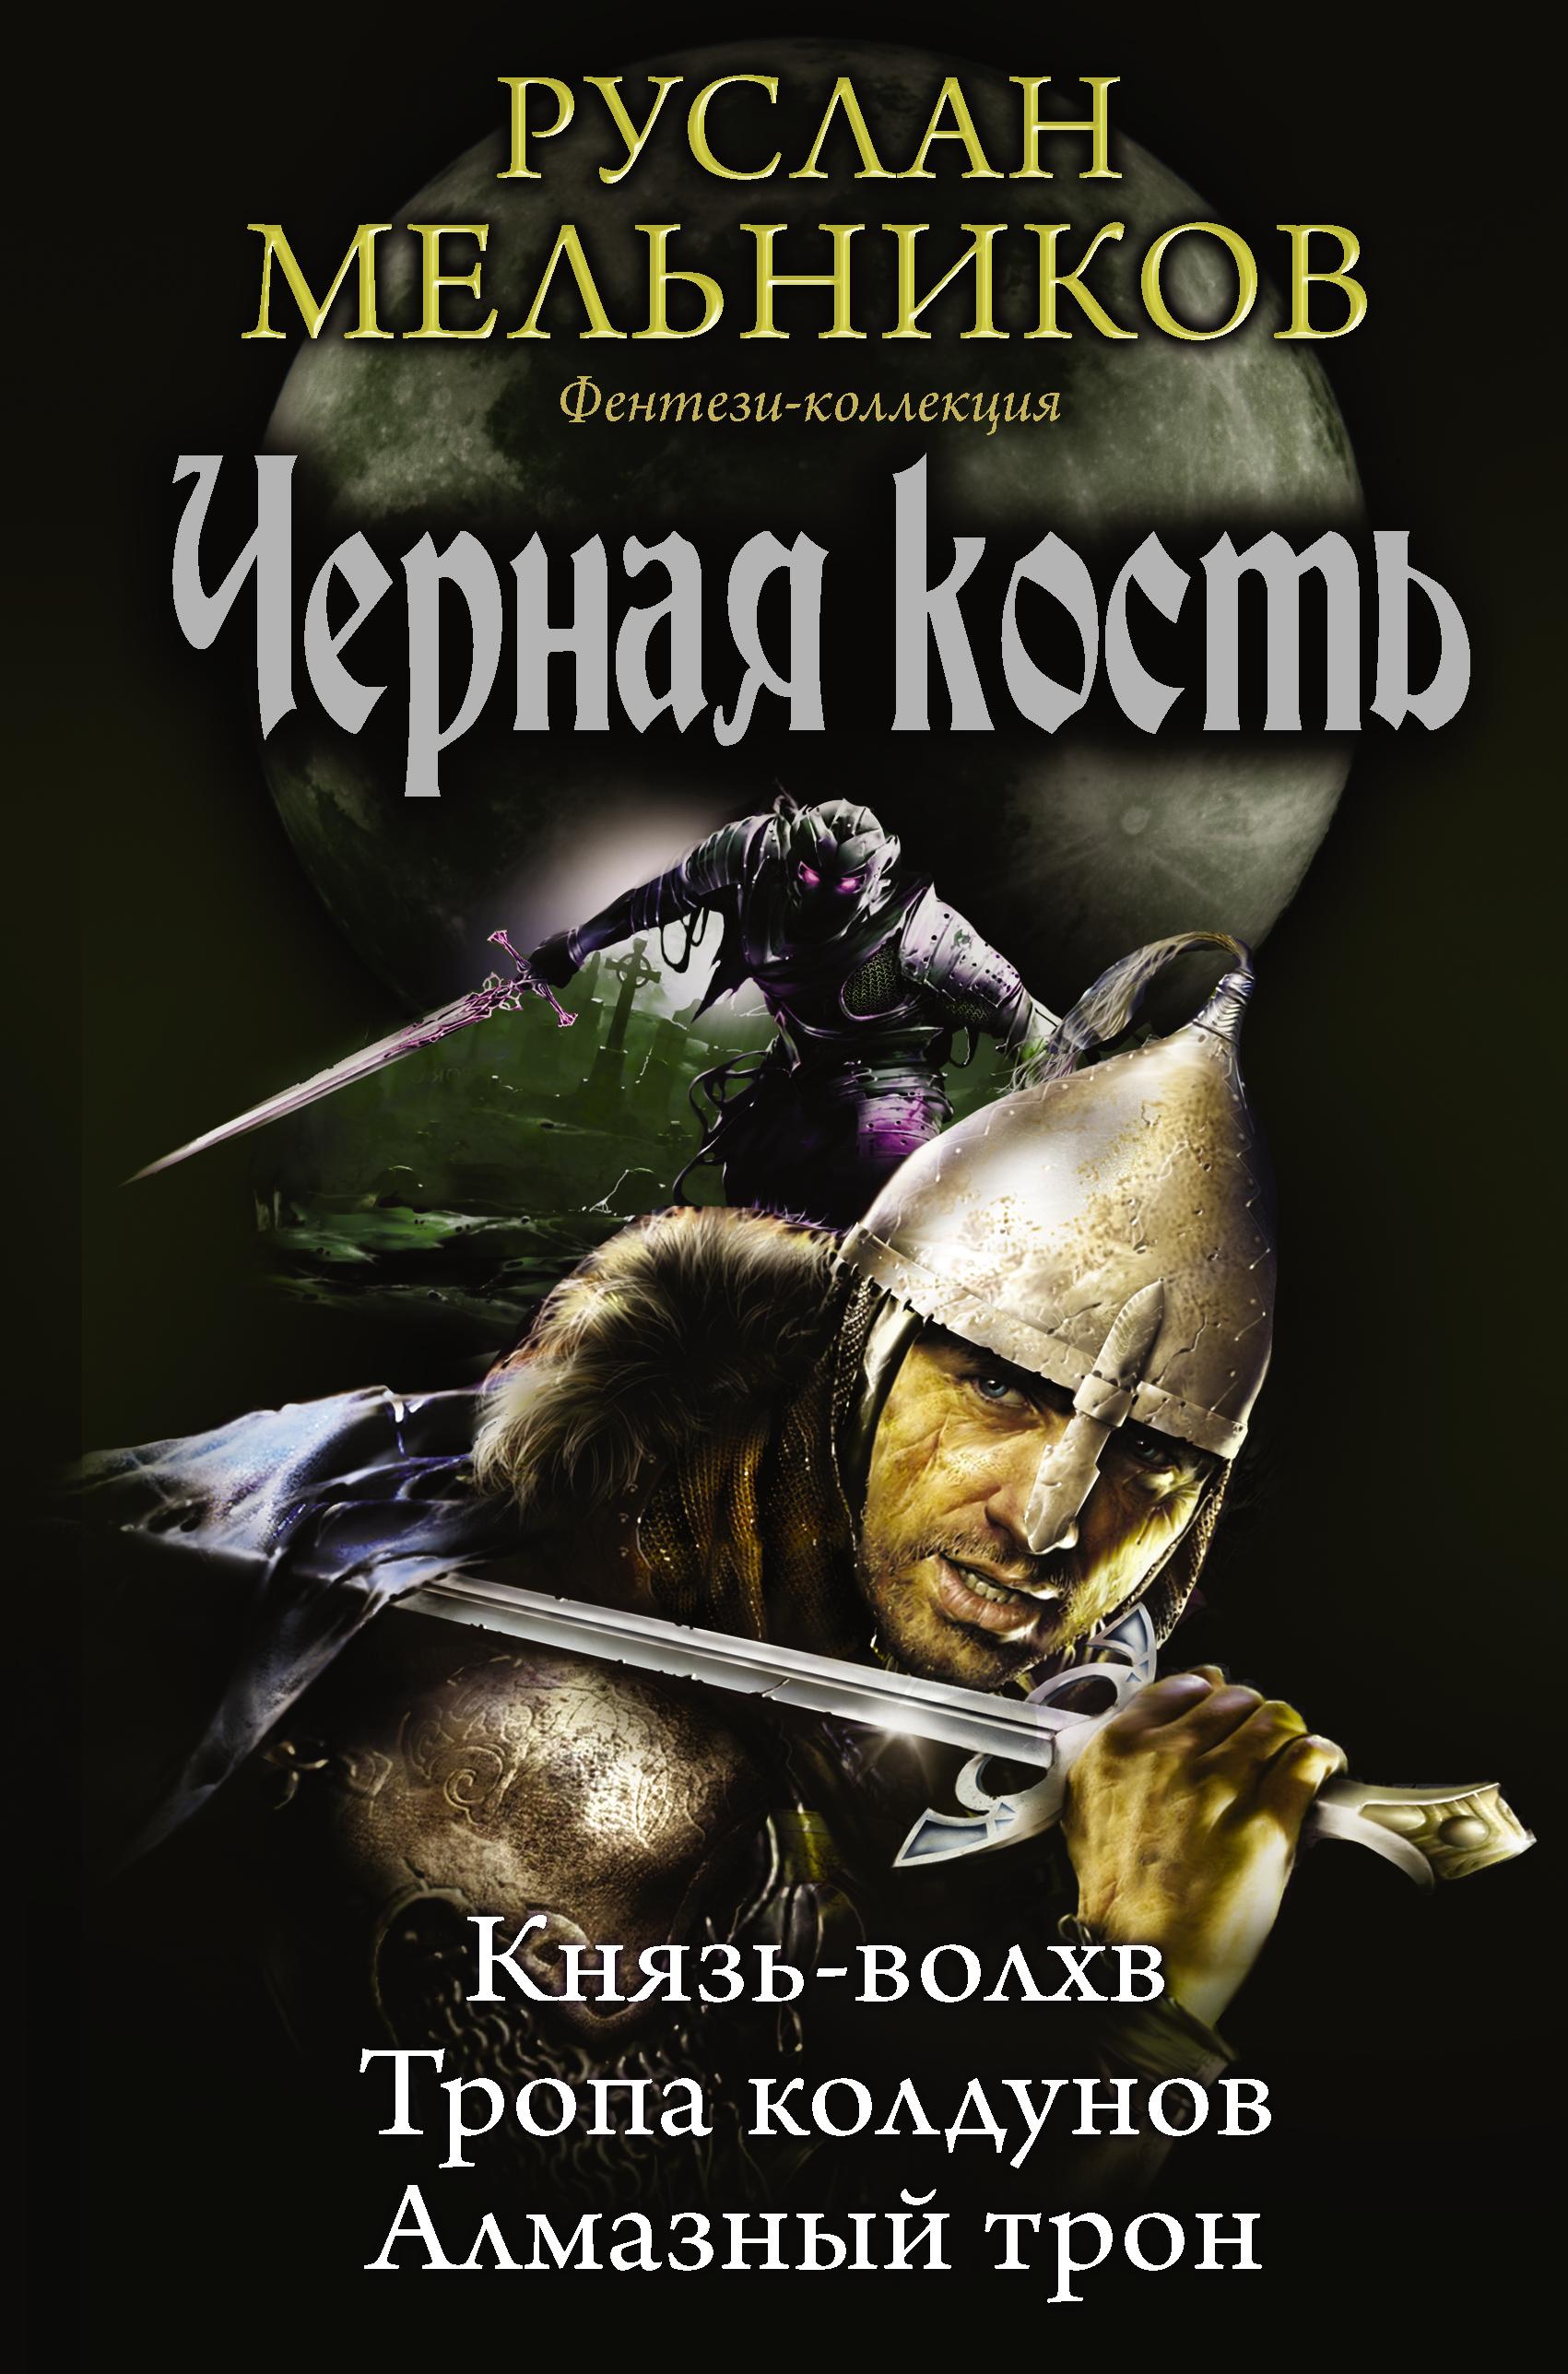 Руслан Мельников Князь-волхв. Тропа колдунов. Алмазный трон (сборник) руслан мельников алмазный трон